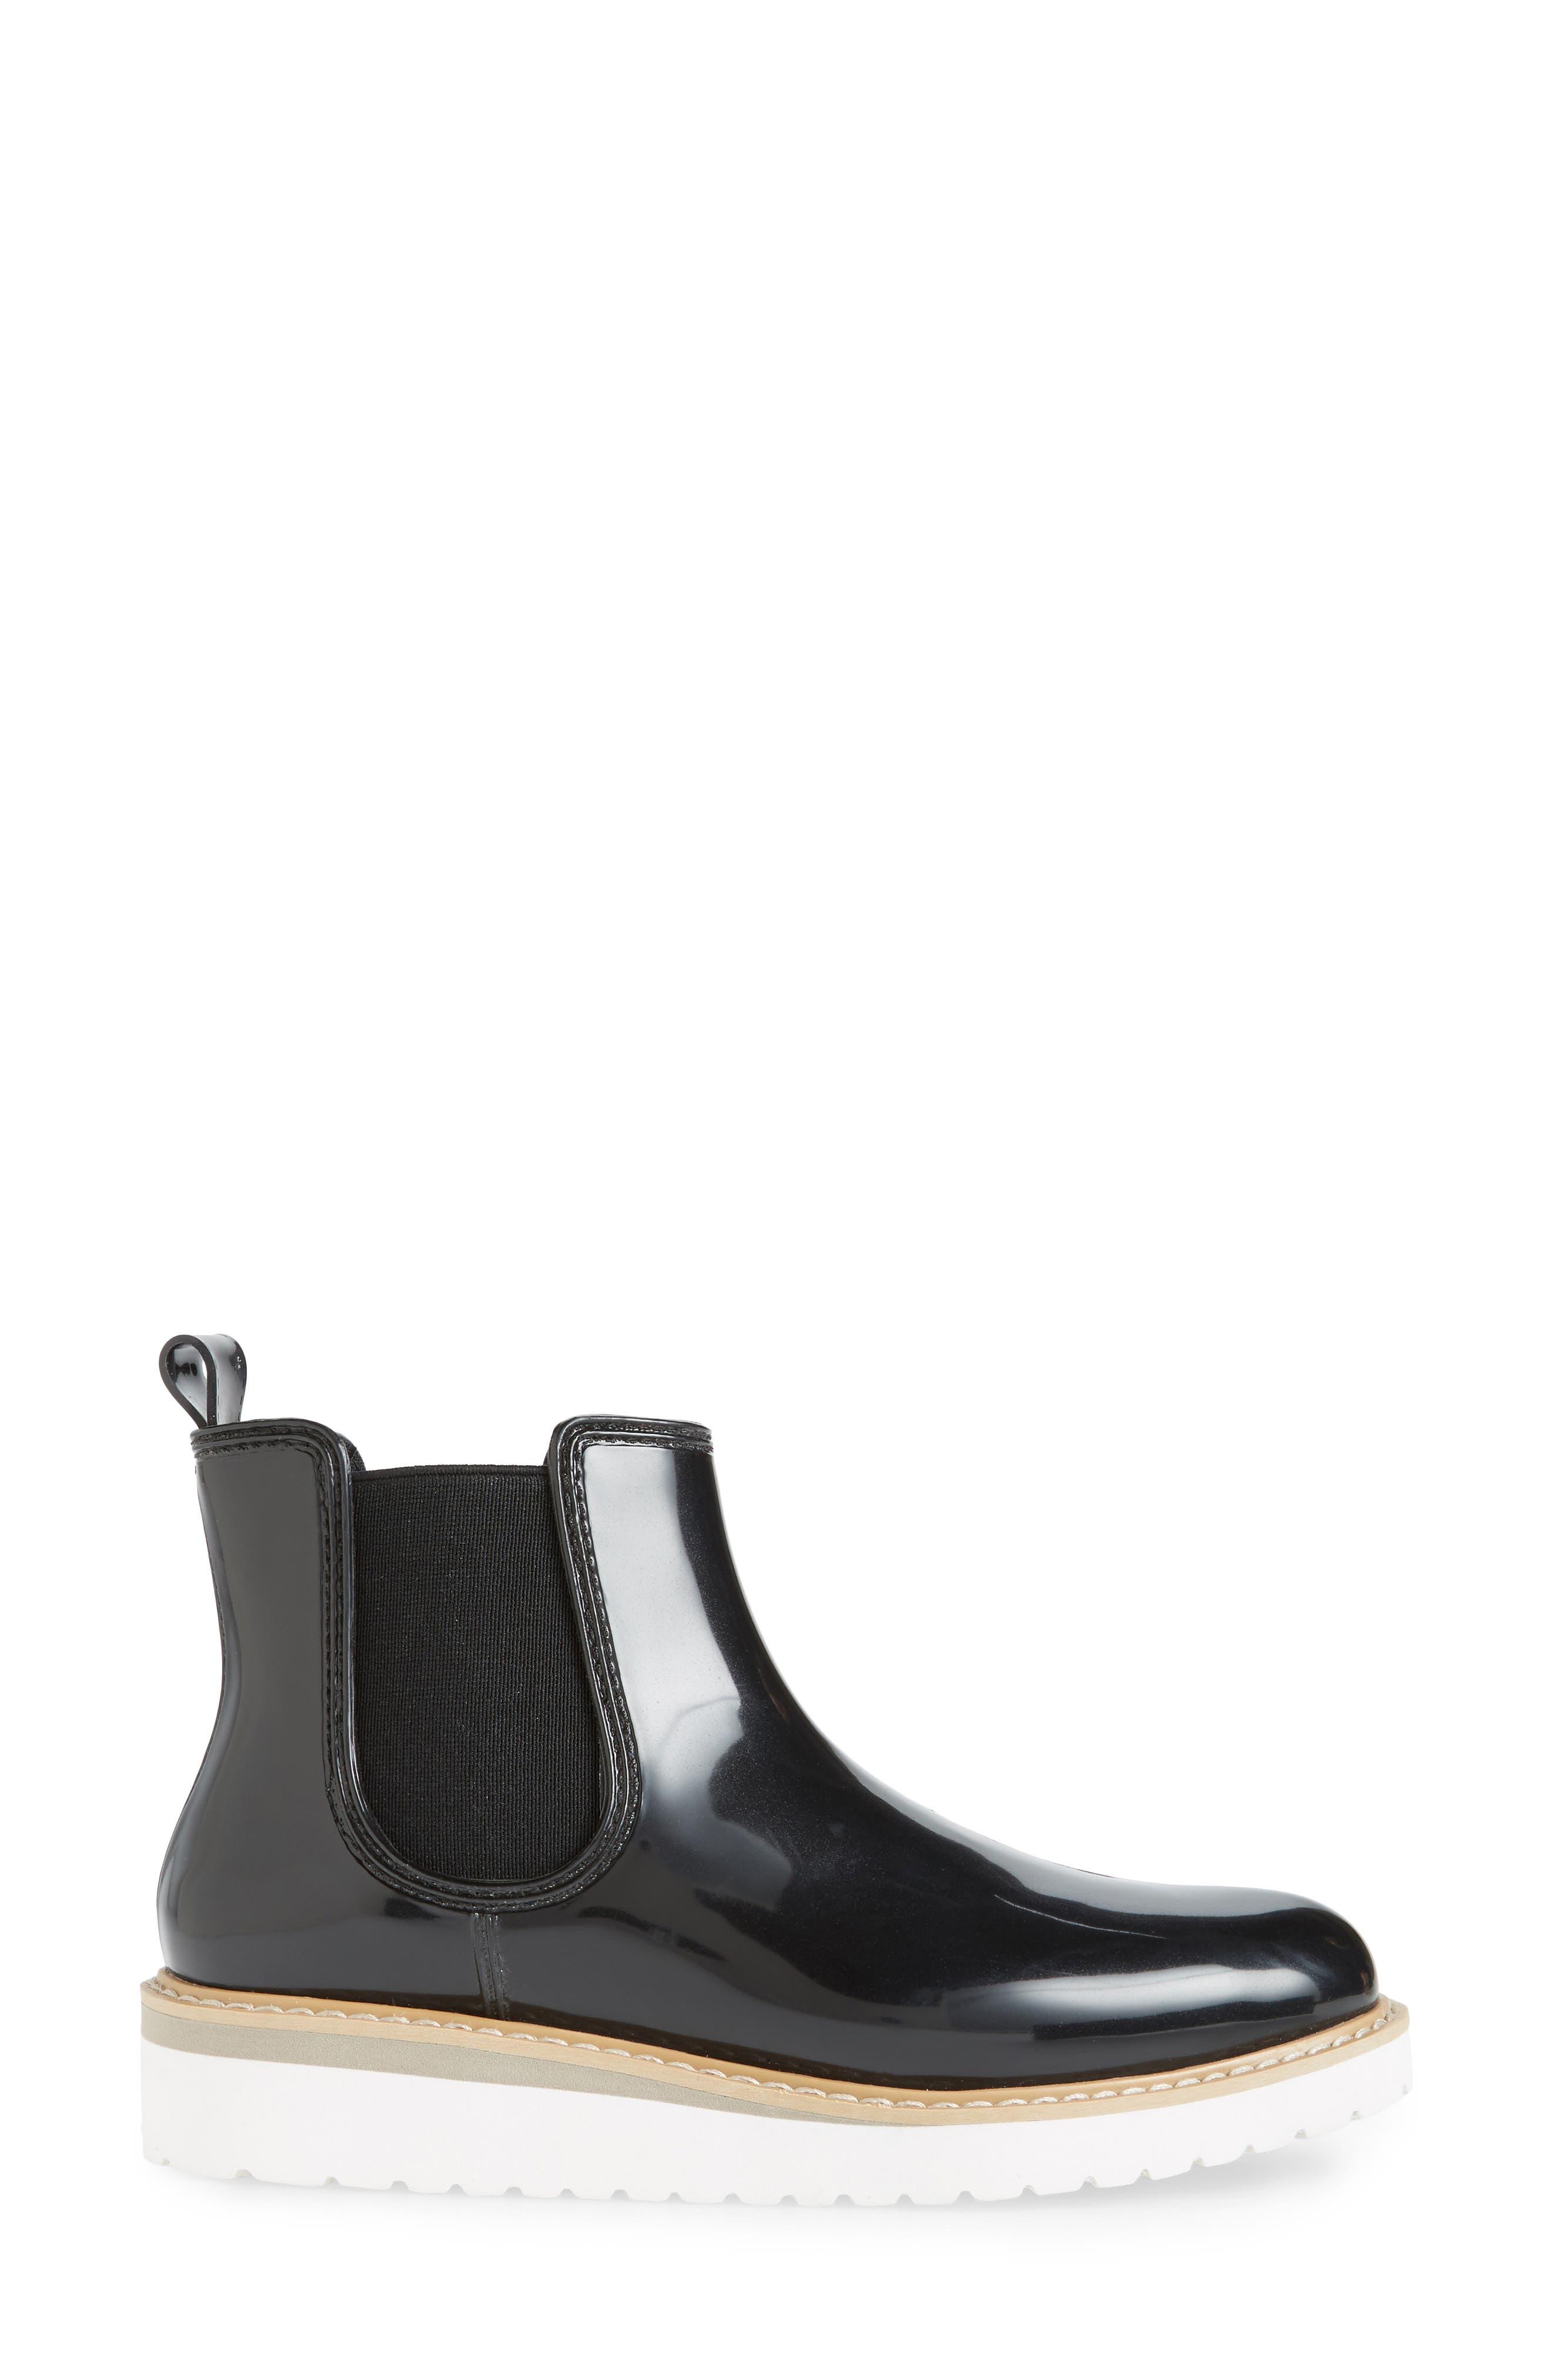 Kensington Chelsea Rain Boot,                             Alternate thumbnail 3, color,                             BLACK/ WHITE